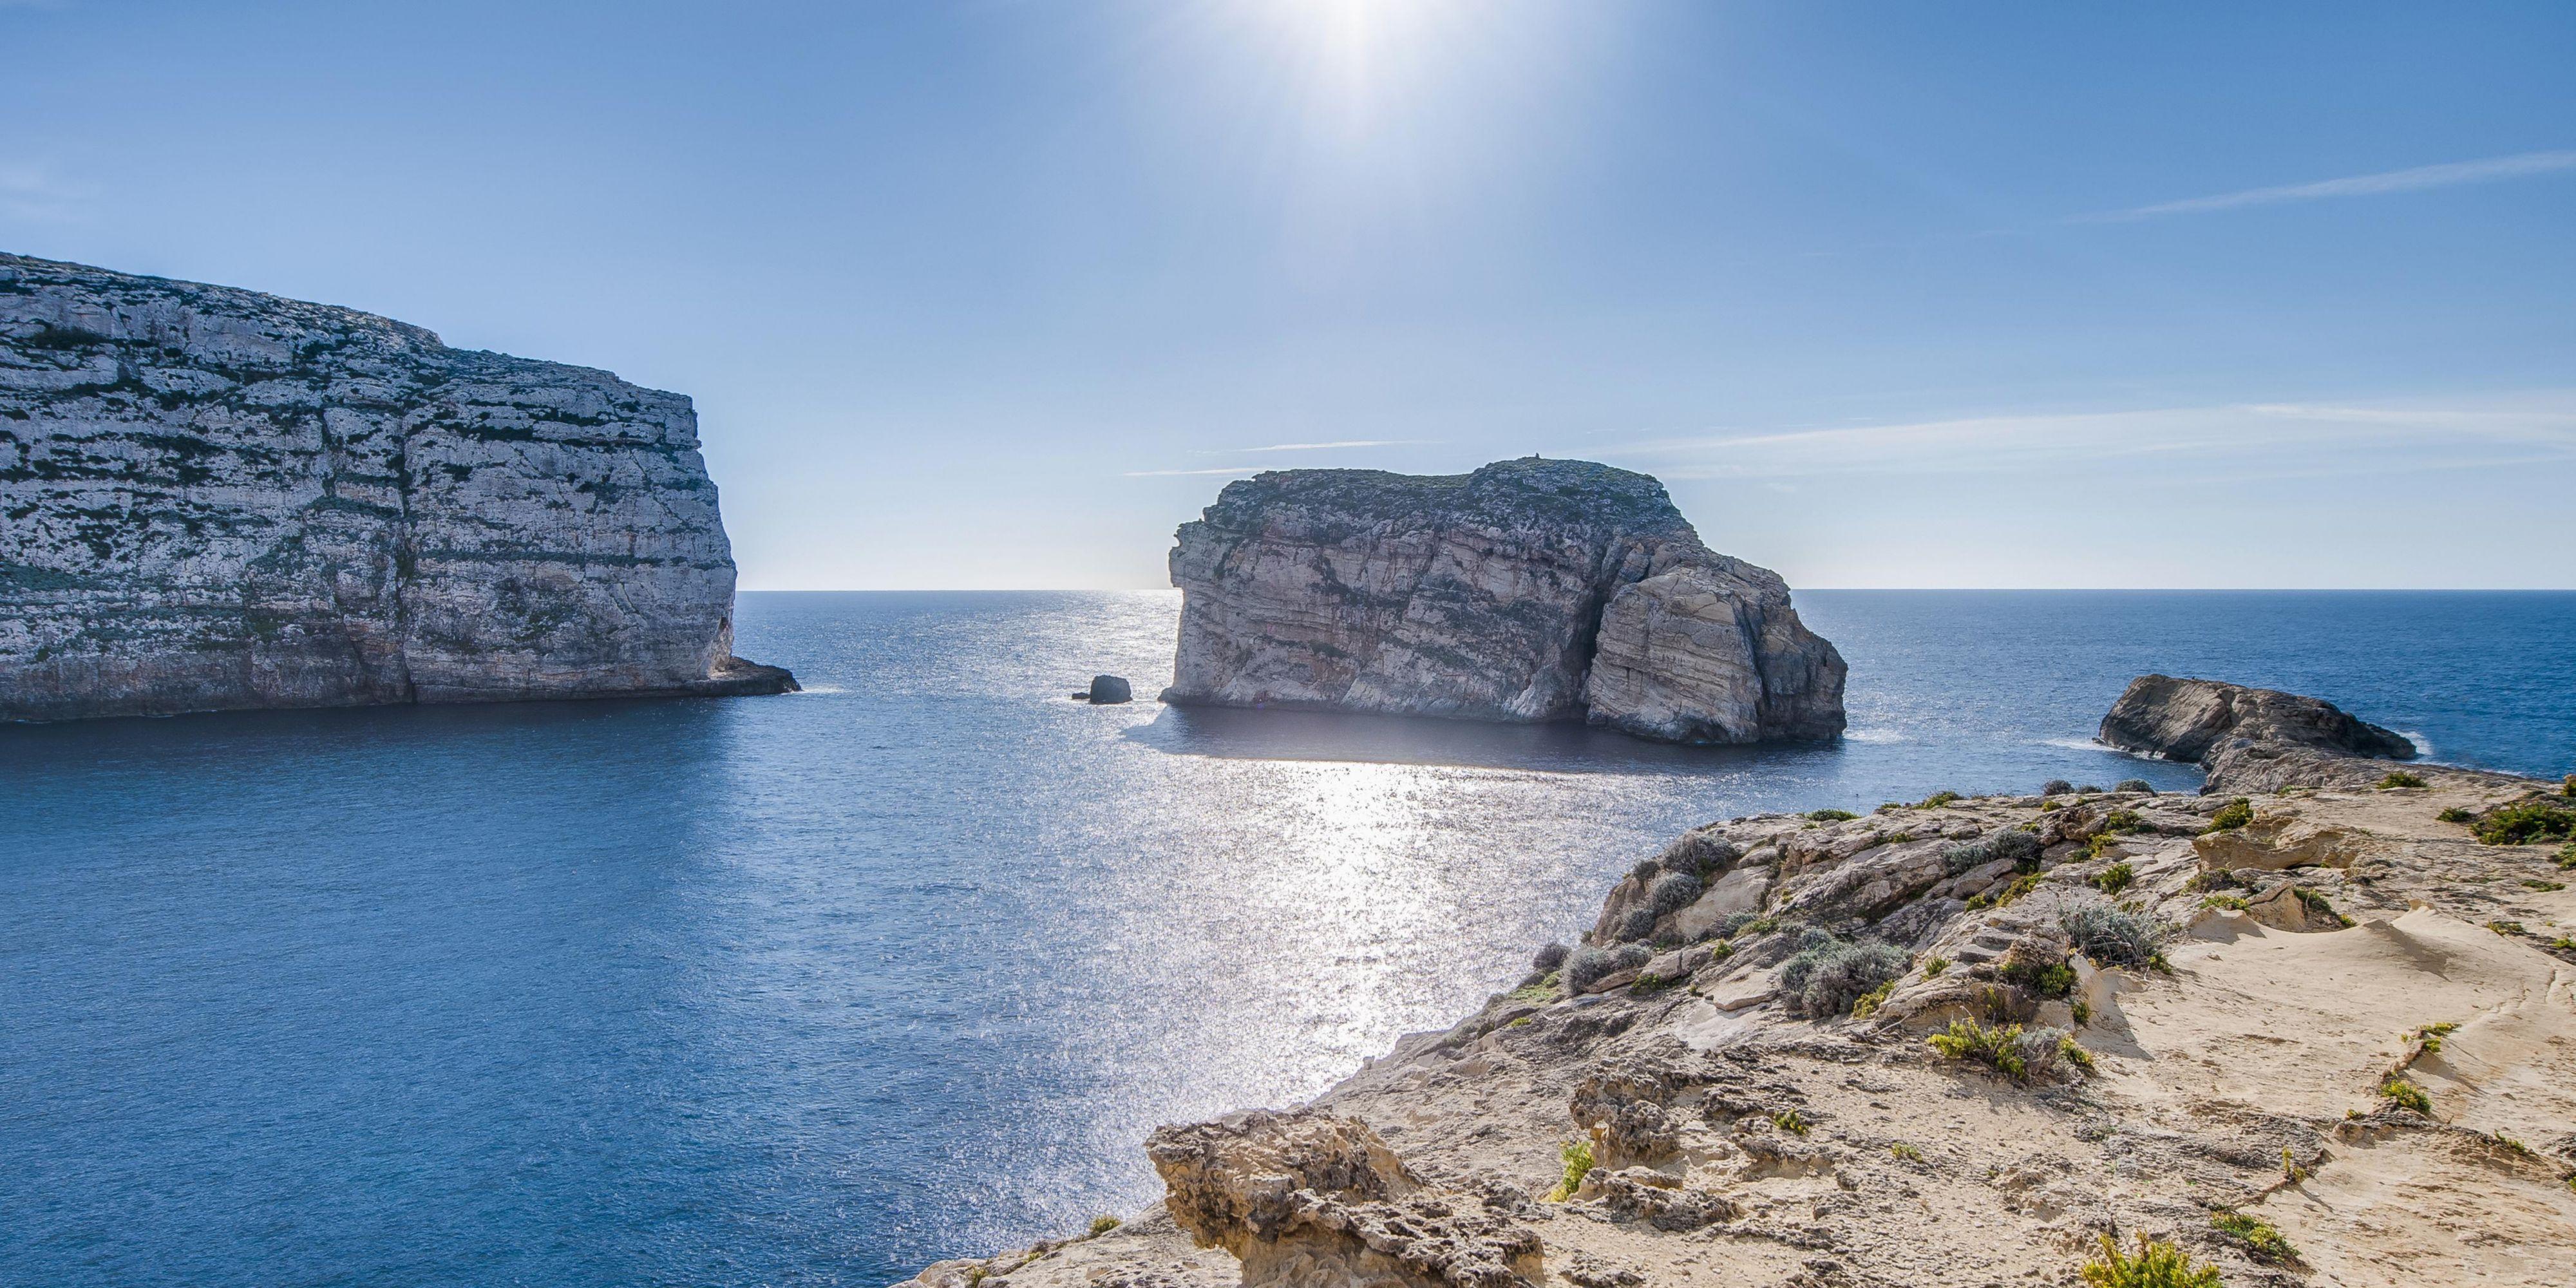 Luxury Beach Hotel With Outdoor Pool: InterContinental Malta